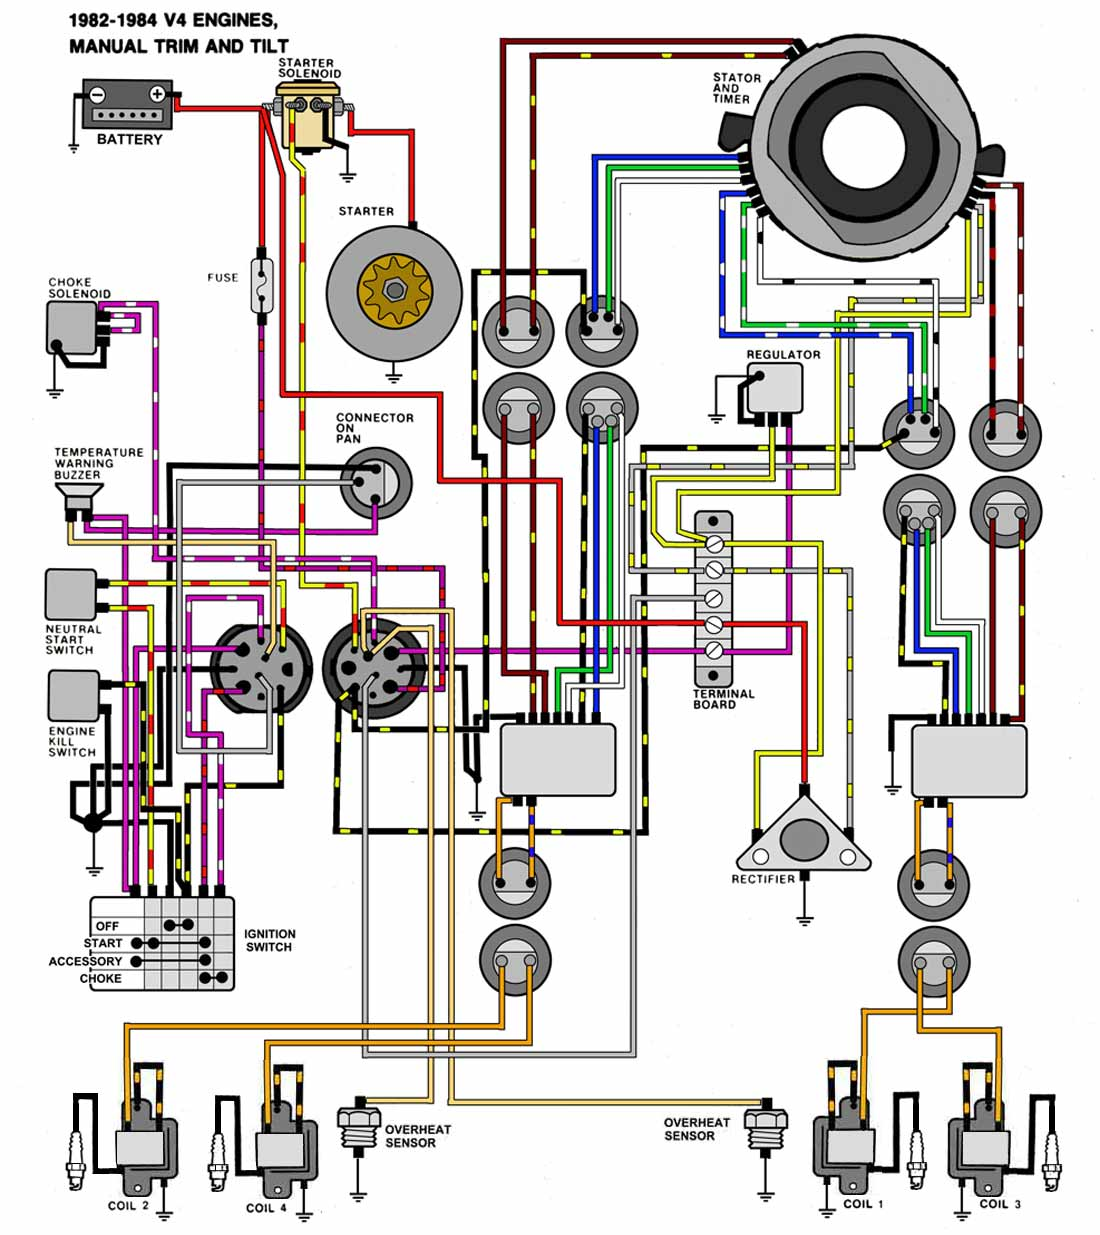 Marvelous Evinrude Johnson Outboard Wiring Diagrams Mastertech Marine Wiring Cloud Staixaidewilluminateatxorg